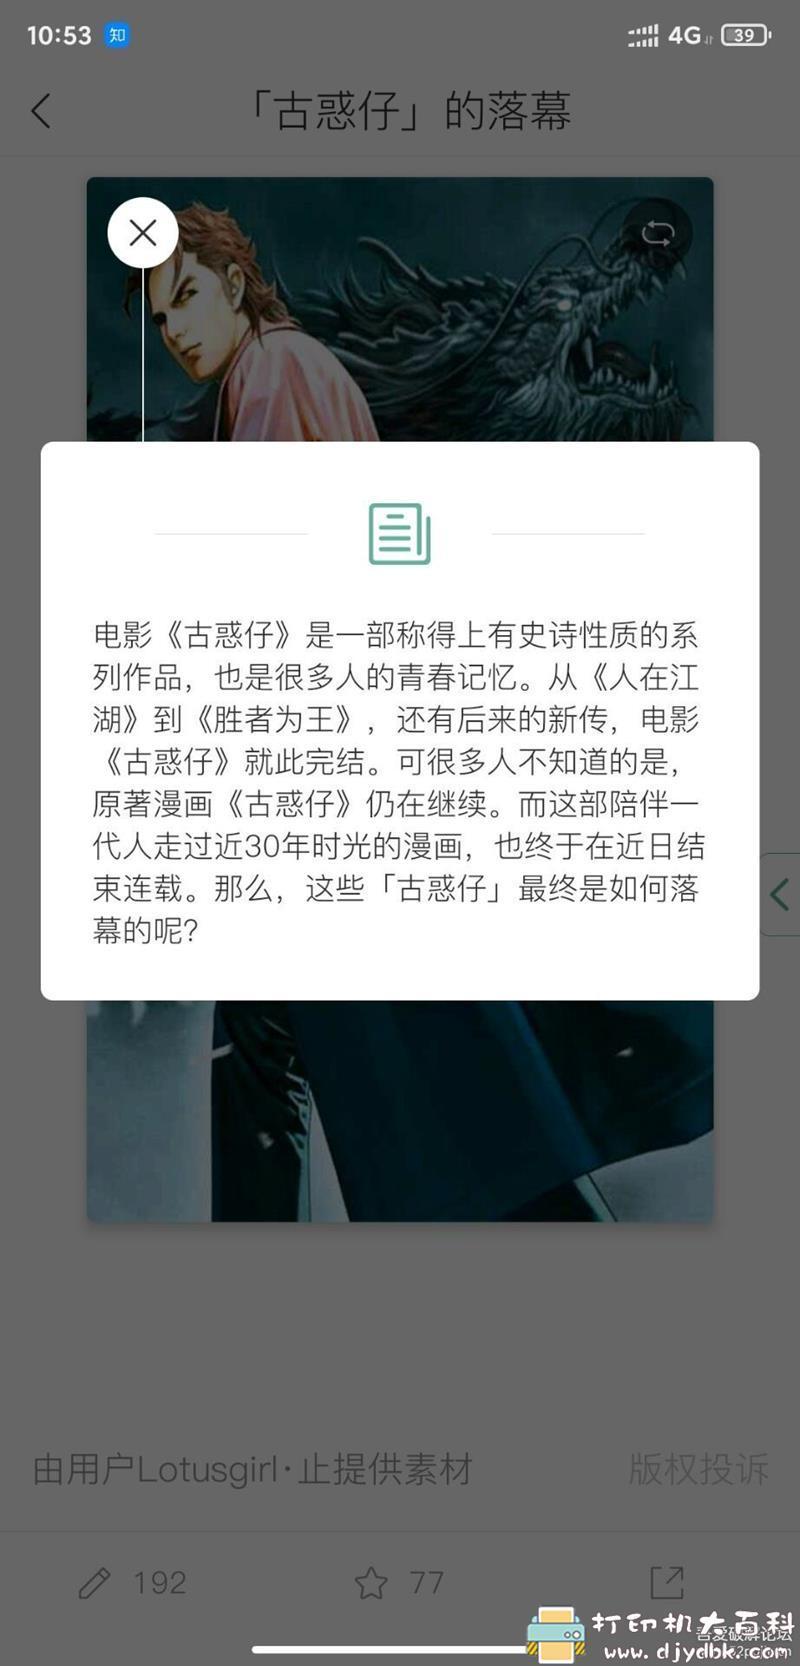 [Android]让人偷偷成长的App之:鹅说图片 No.5